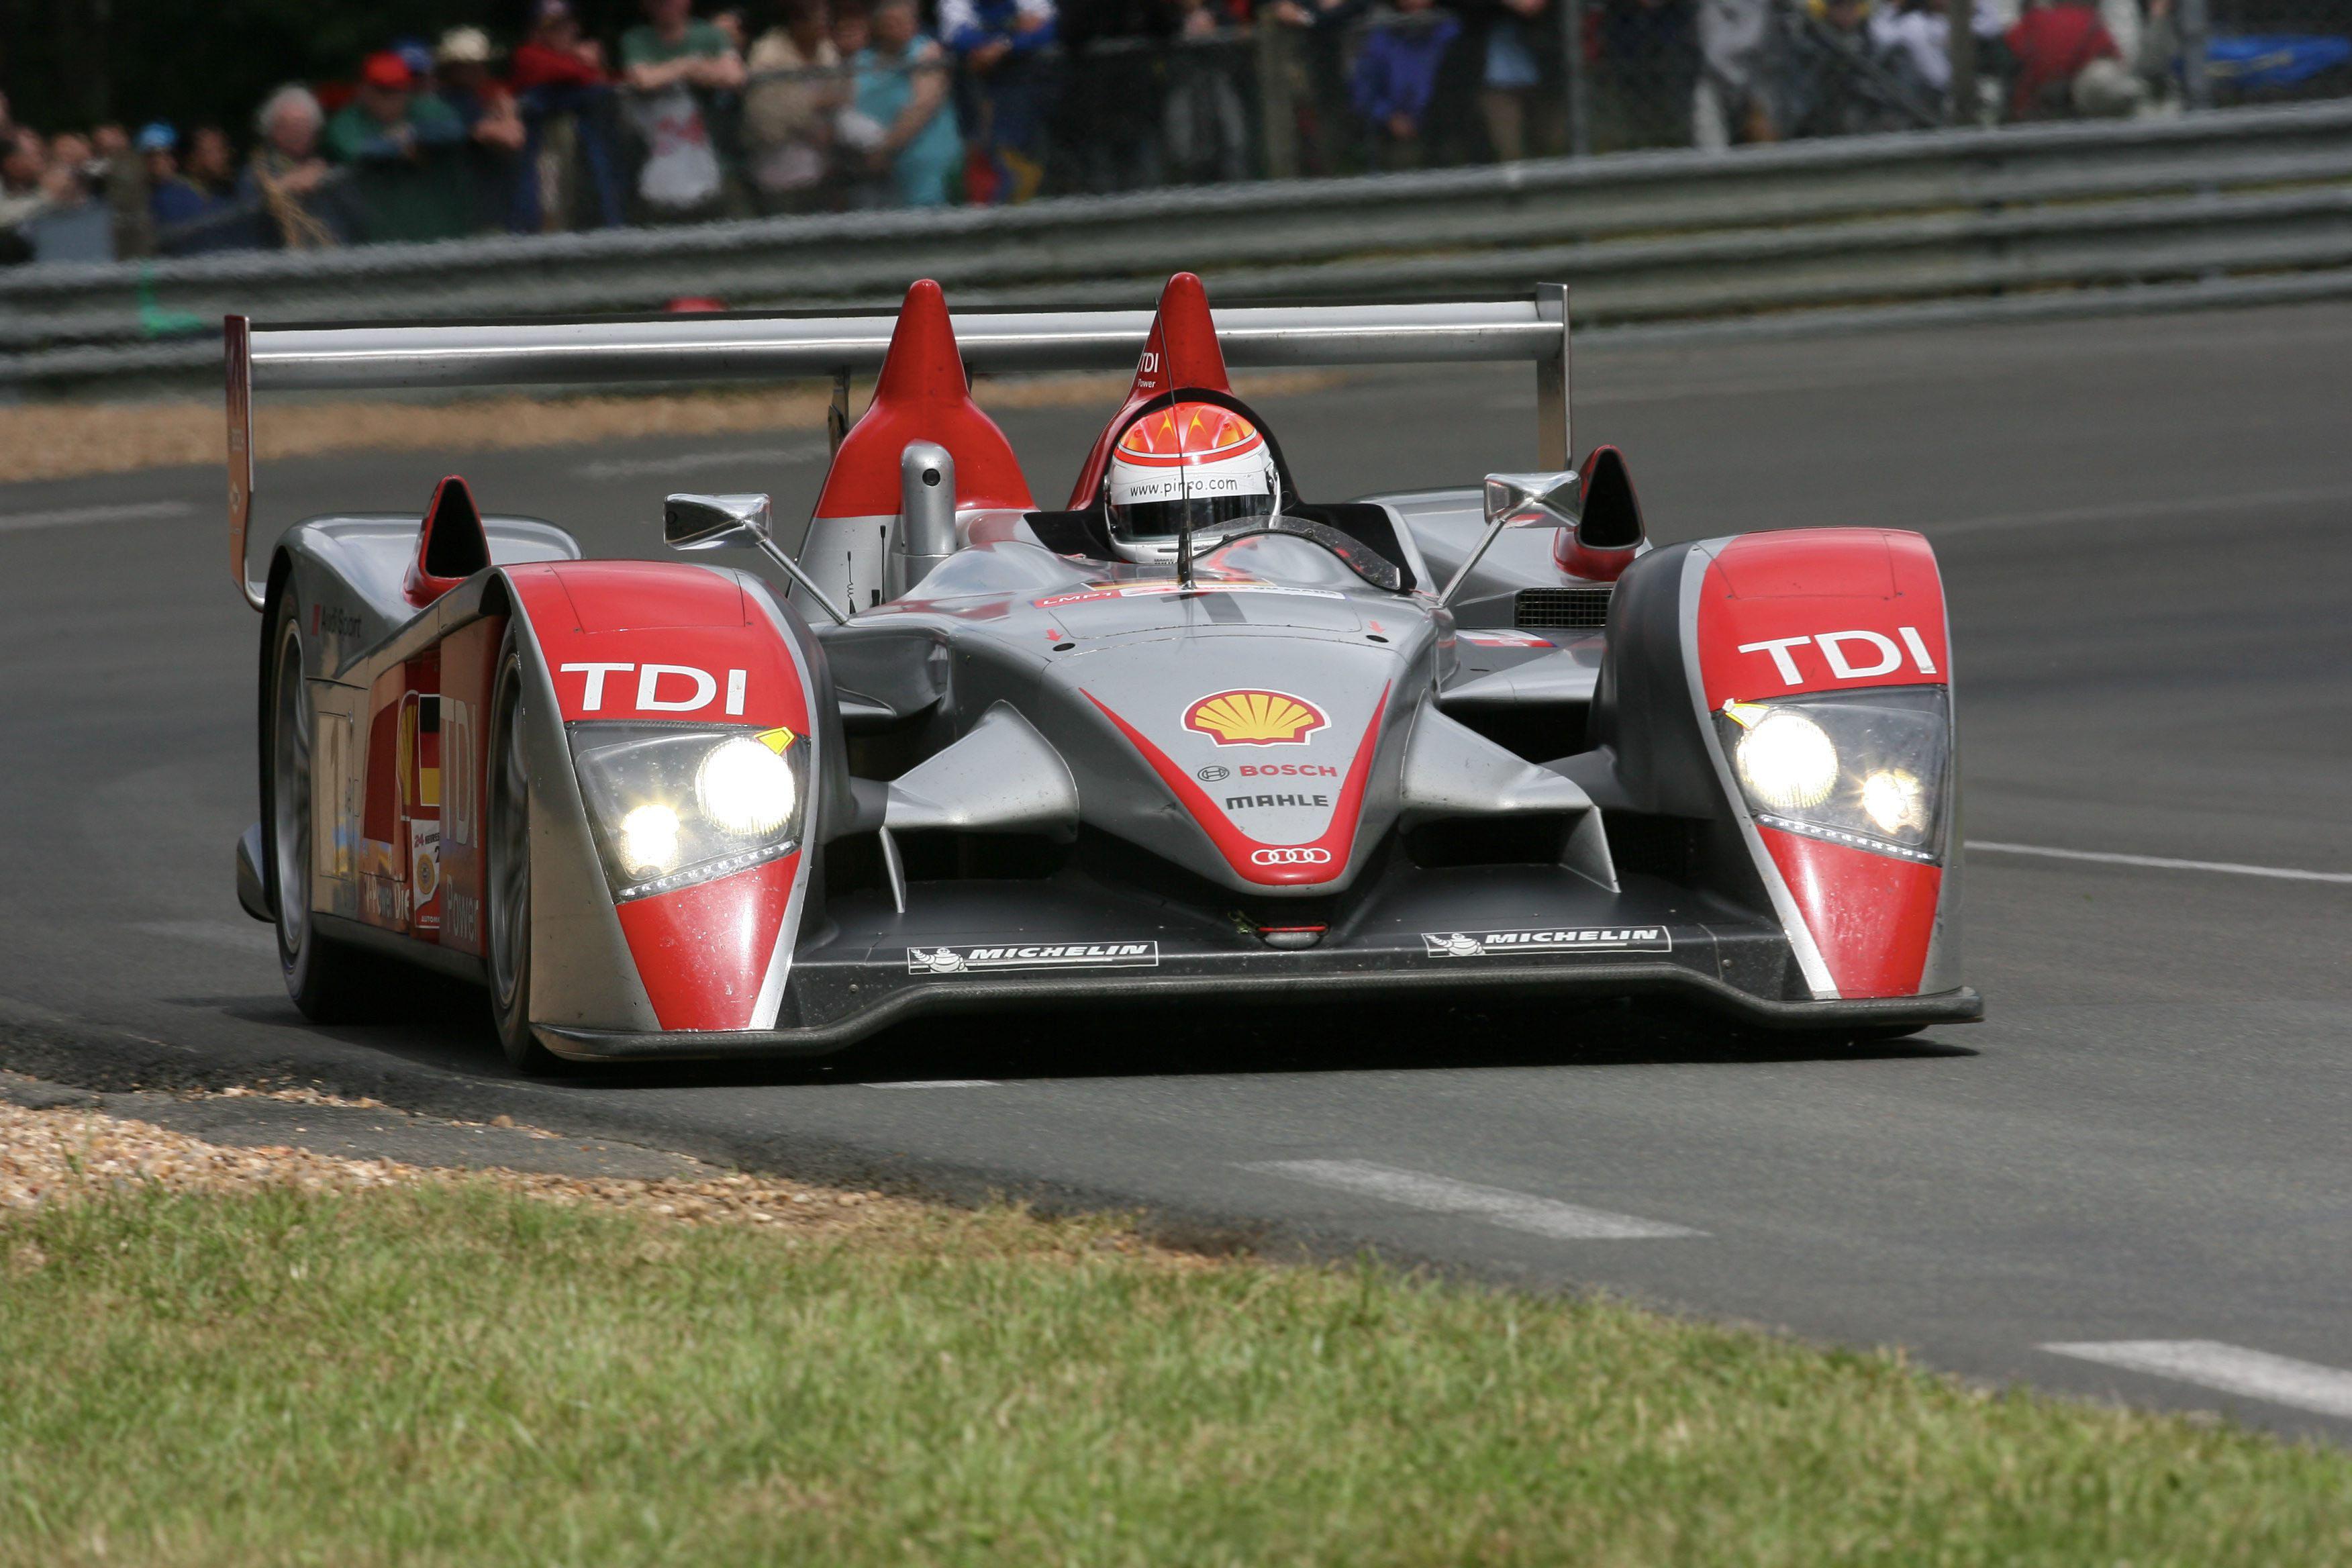 Emanuele Pirro Audi Le Mans 24 Hours 2007